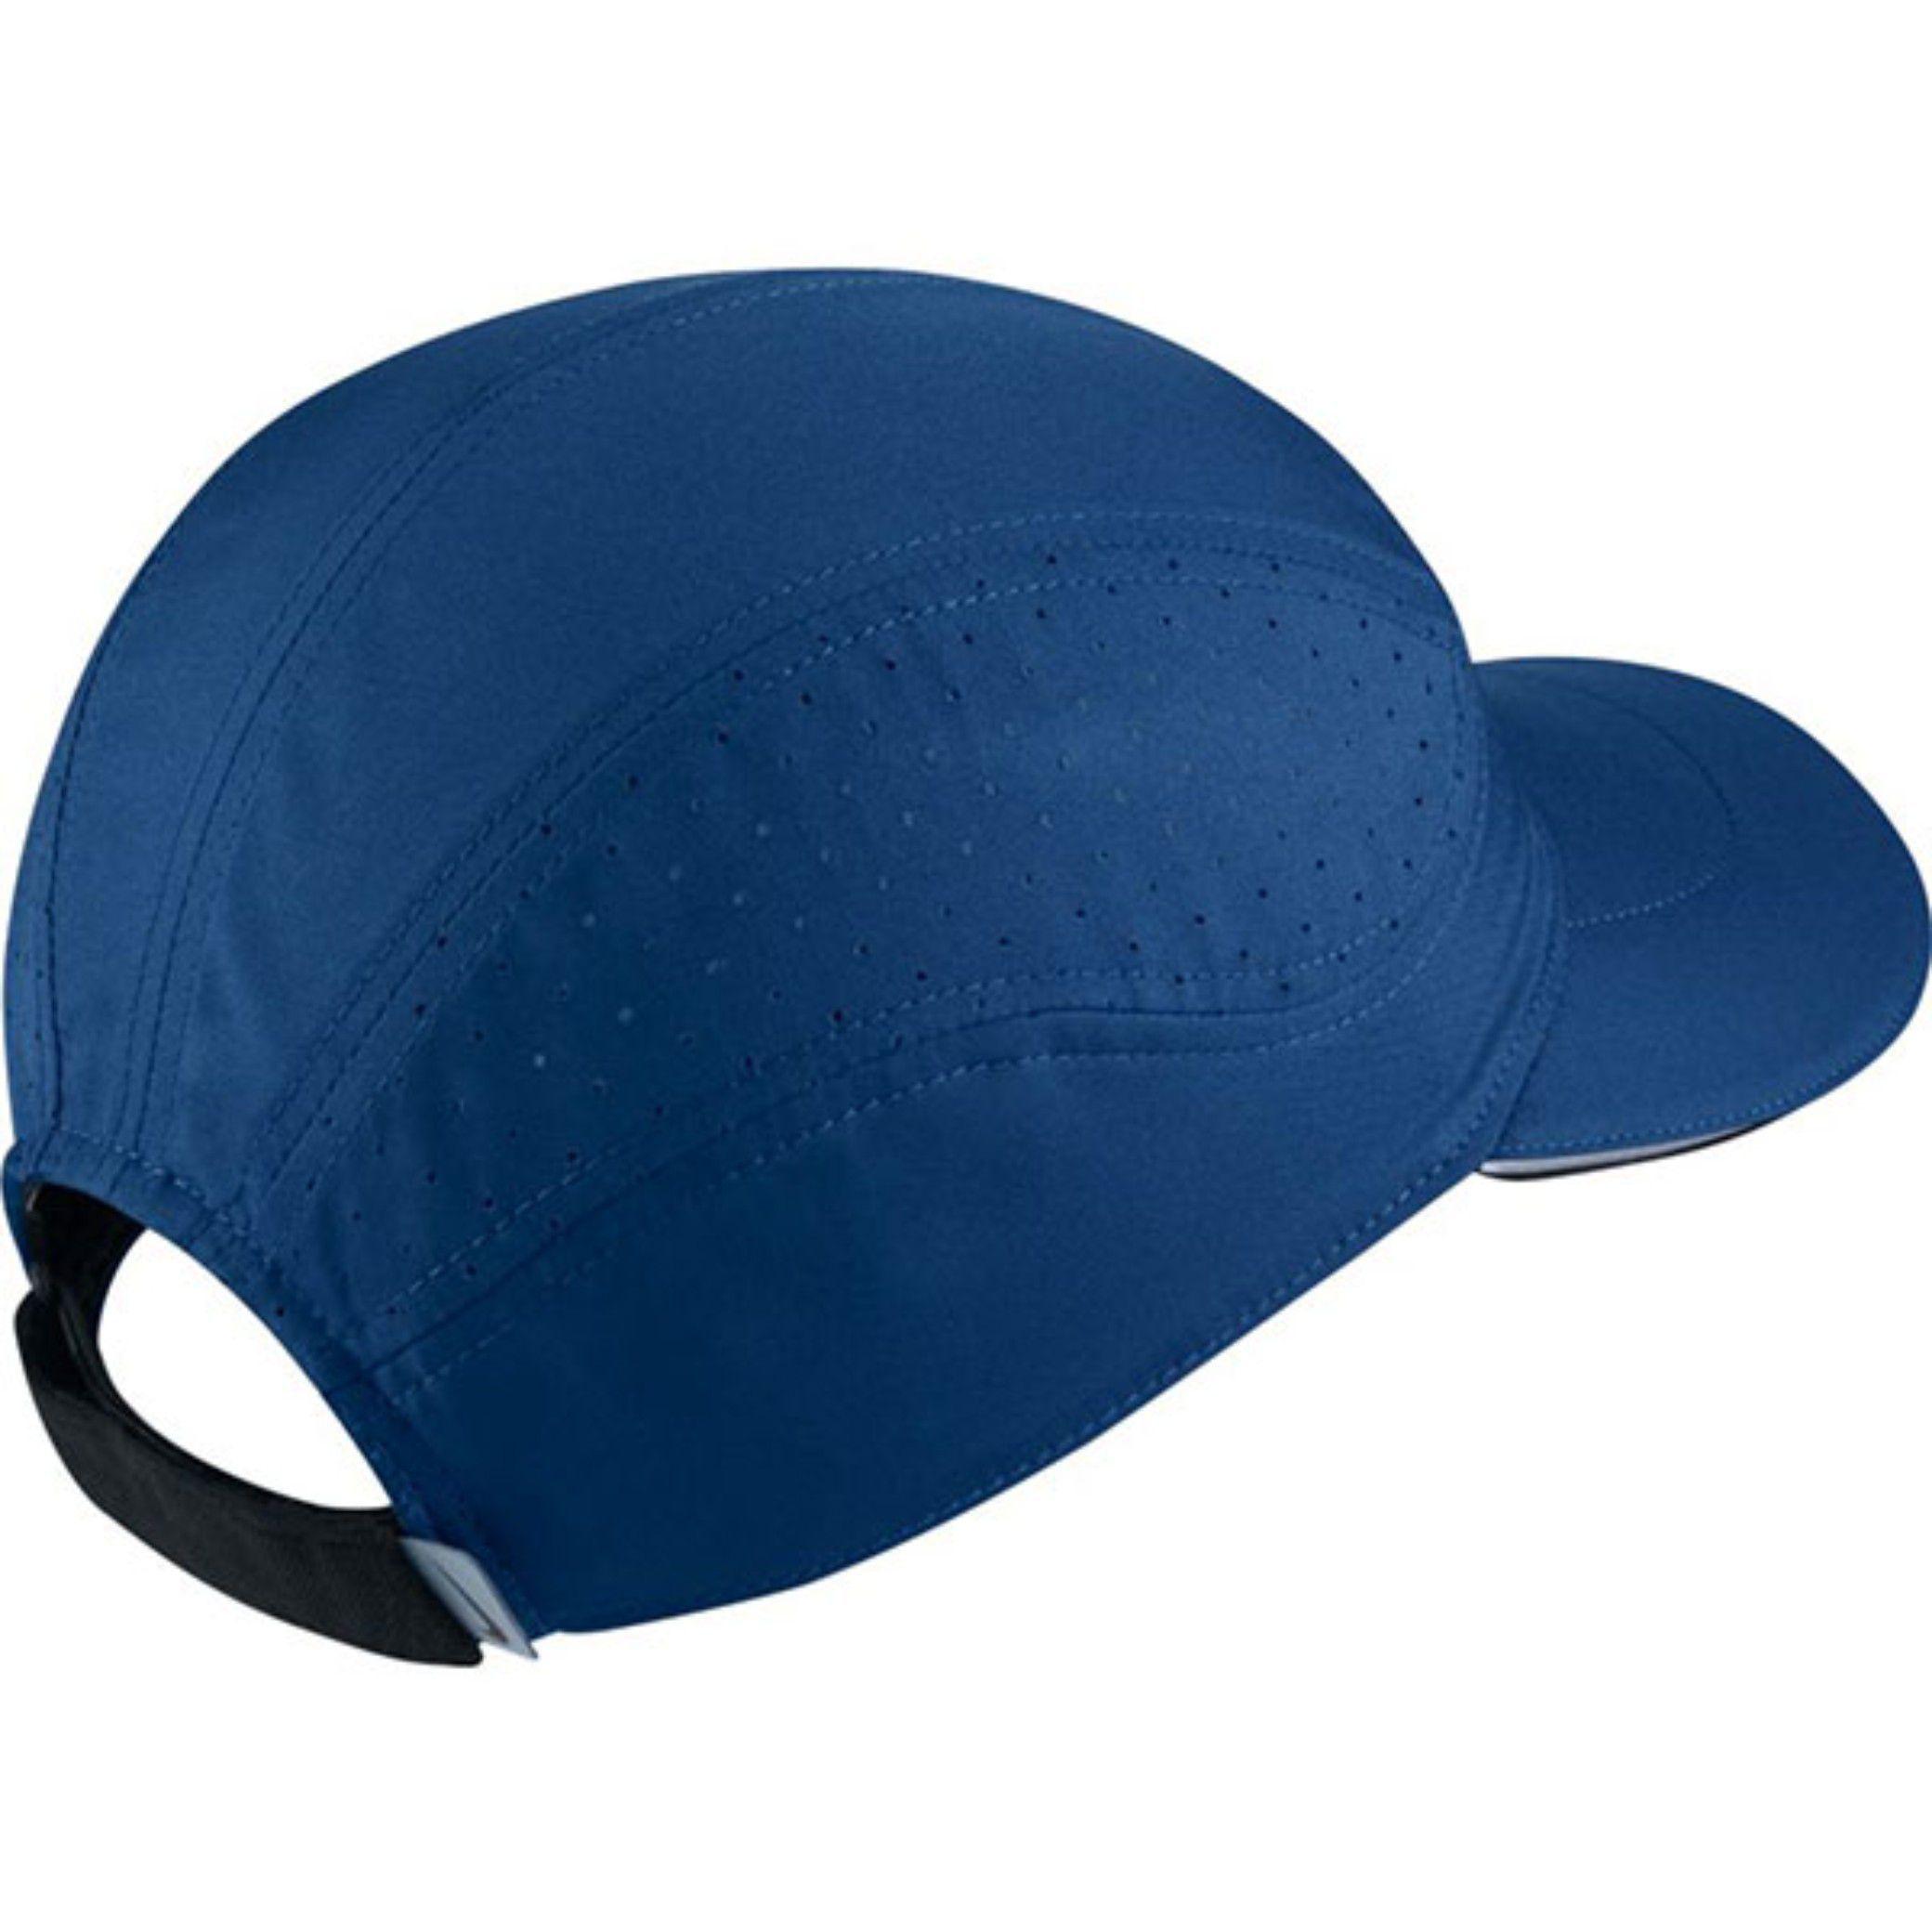 13aaafe1165 Nike Blue Printed Polyester Caps Nike Blue Printed Polyester Caps